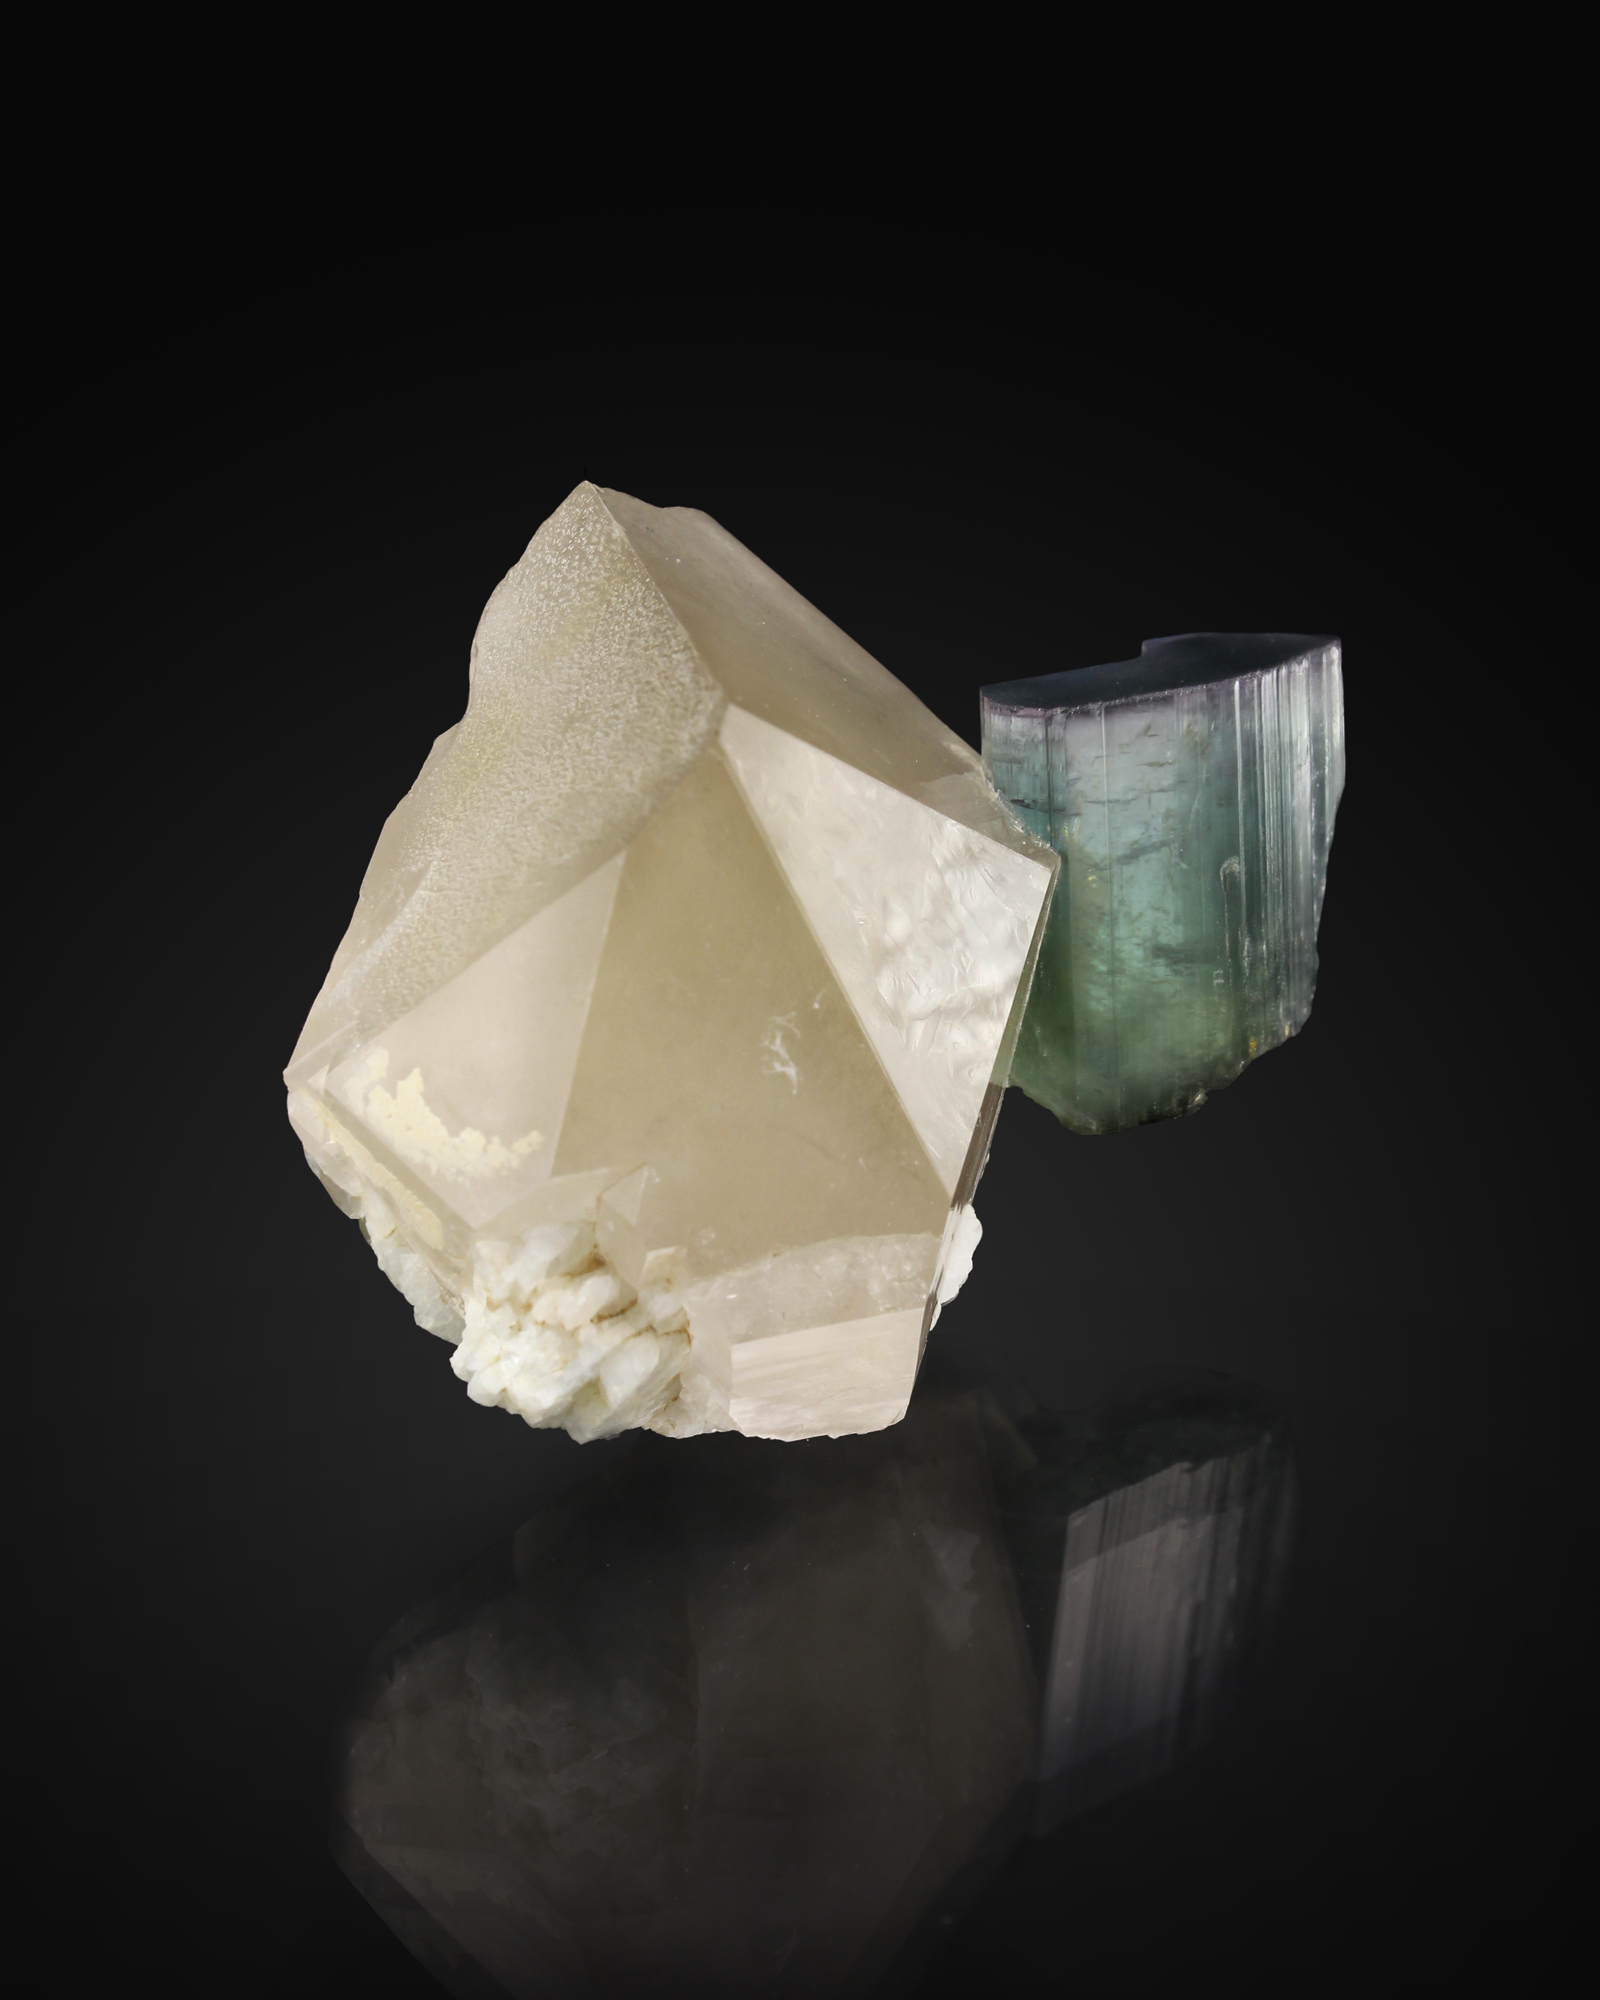 TOURMALINE ON QUARTZ -Cryo-Genie Mine, Warner Springs, California  -Dexter Morrison specimen